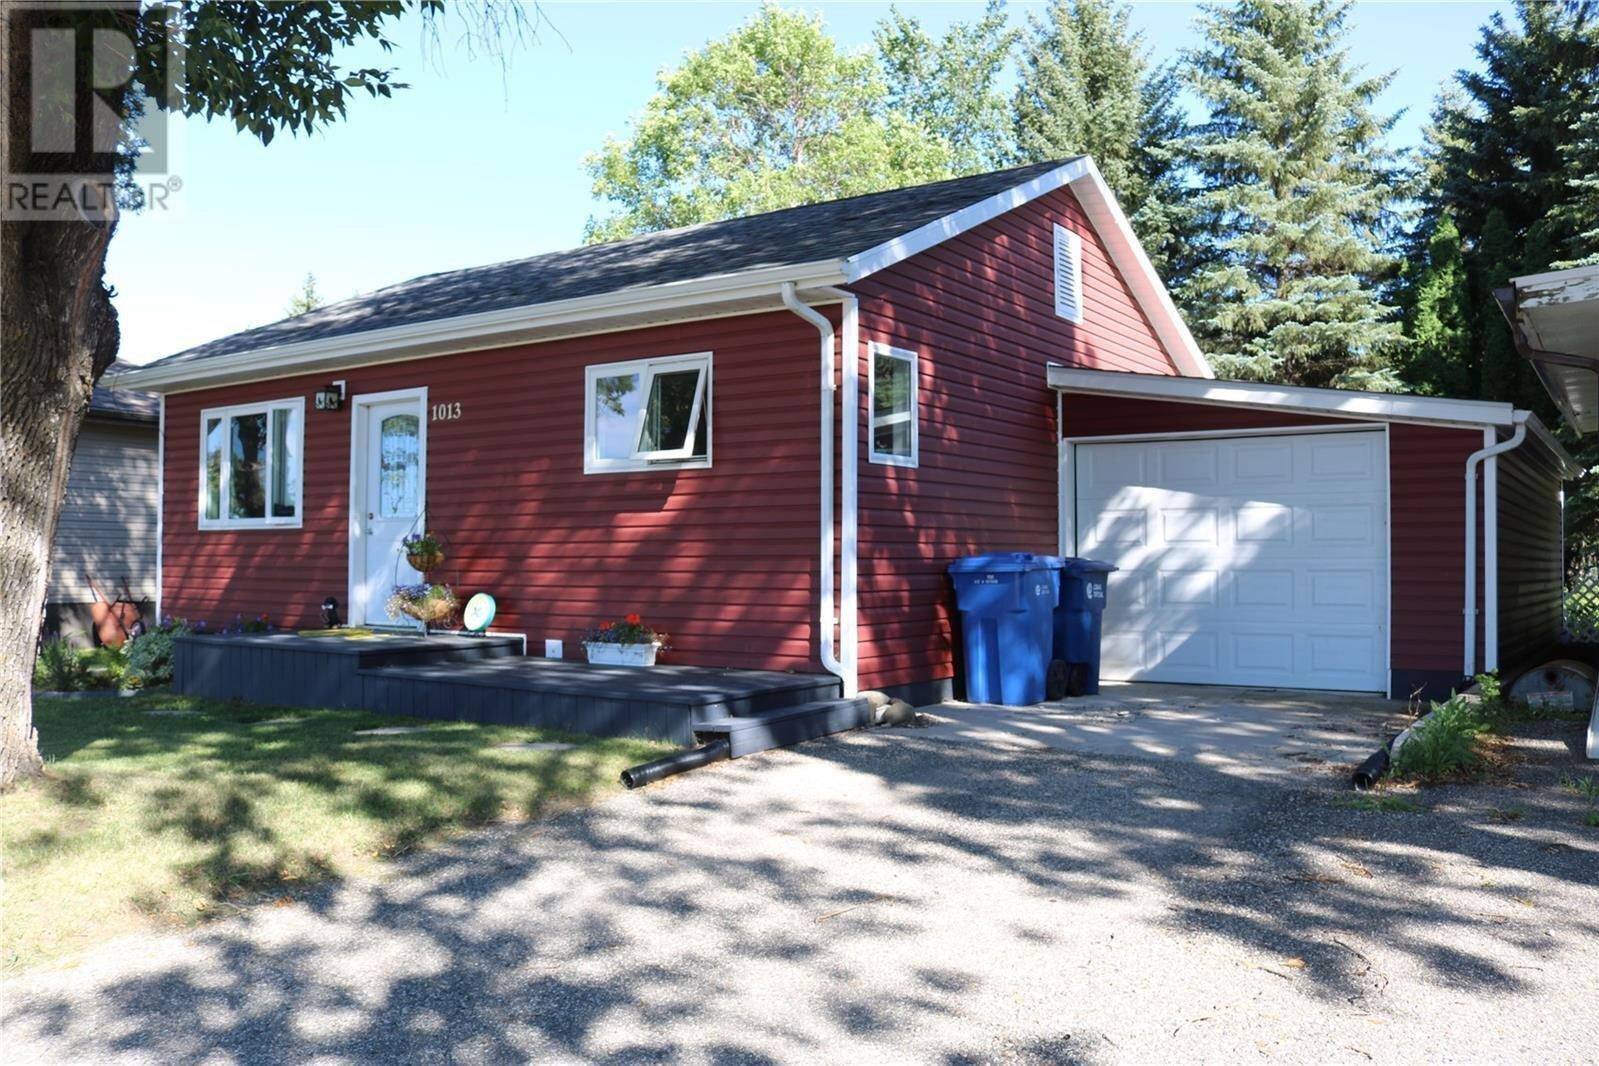 House for sale at 1013 Gordon St Moosomin Saskatchewan - MLS: SK821202